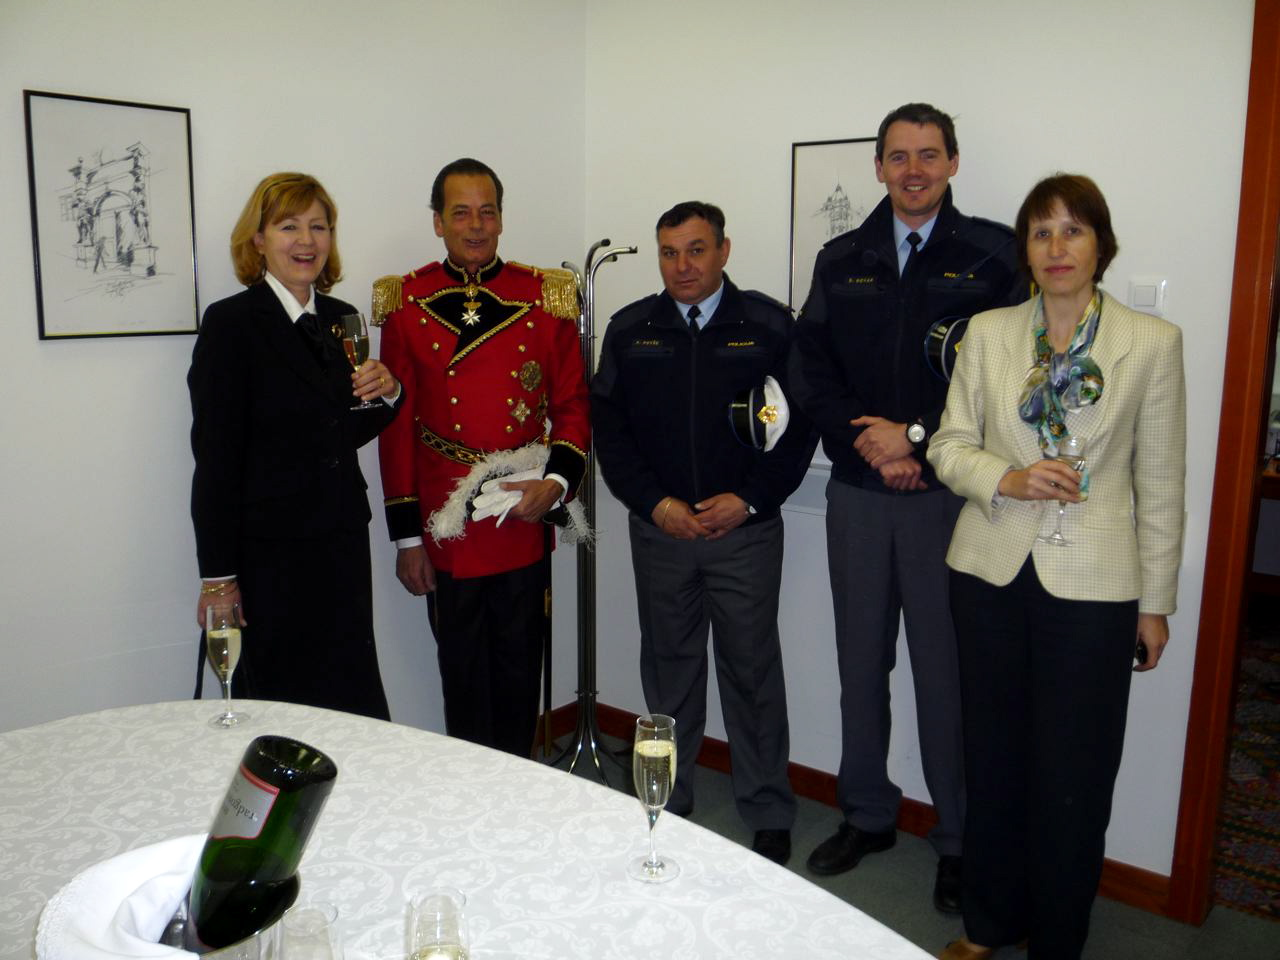 THE CHIEF OF PROTOCOL Mrs. MAJA LORENCIC SVETEK AND THE ASSISTENT Mrs. ALENKA GOLJAR AND THE POLICE ESCORT